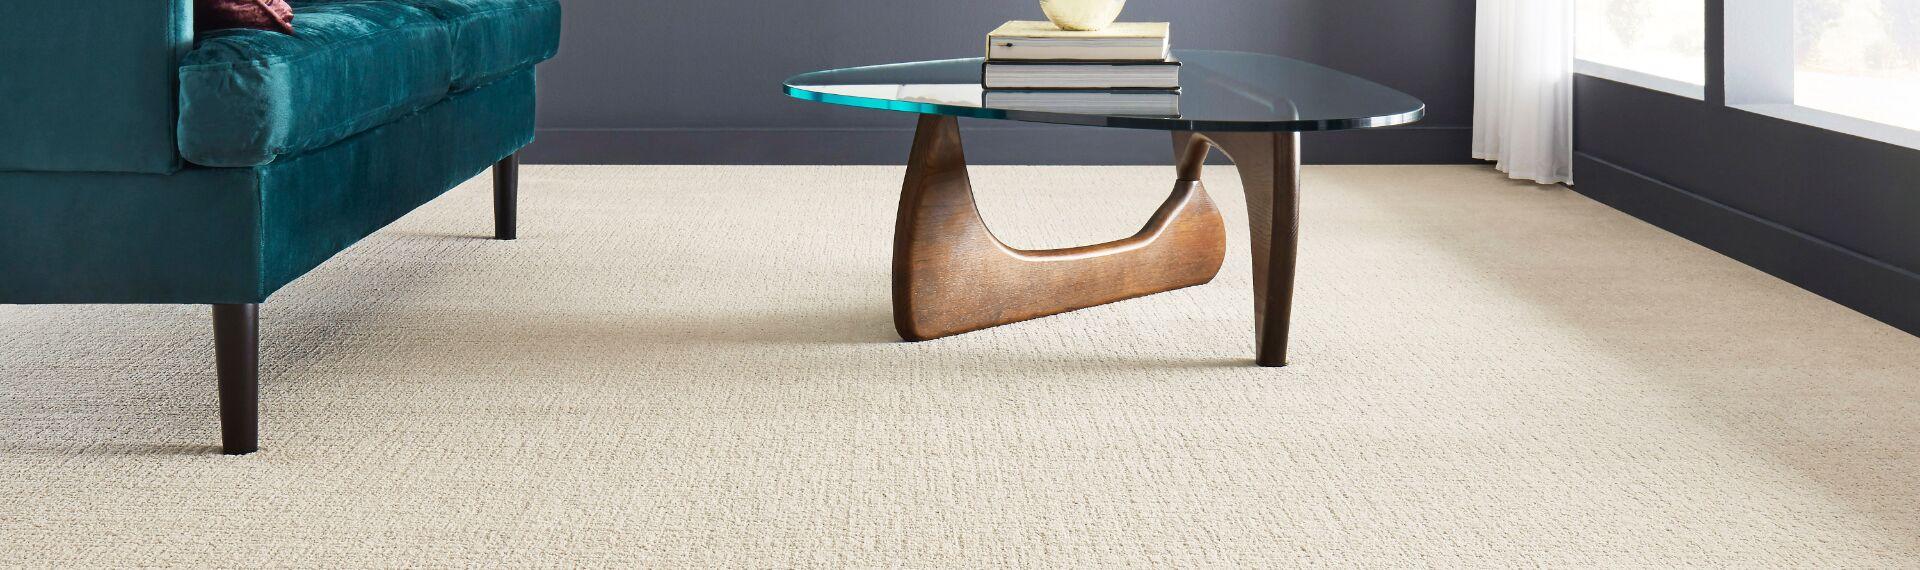 fabrica-carpet-min.jpg